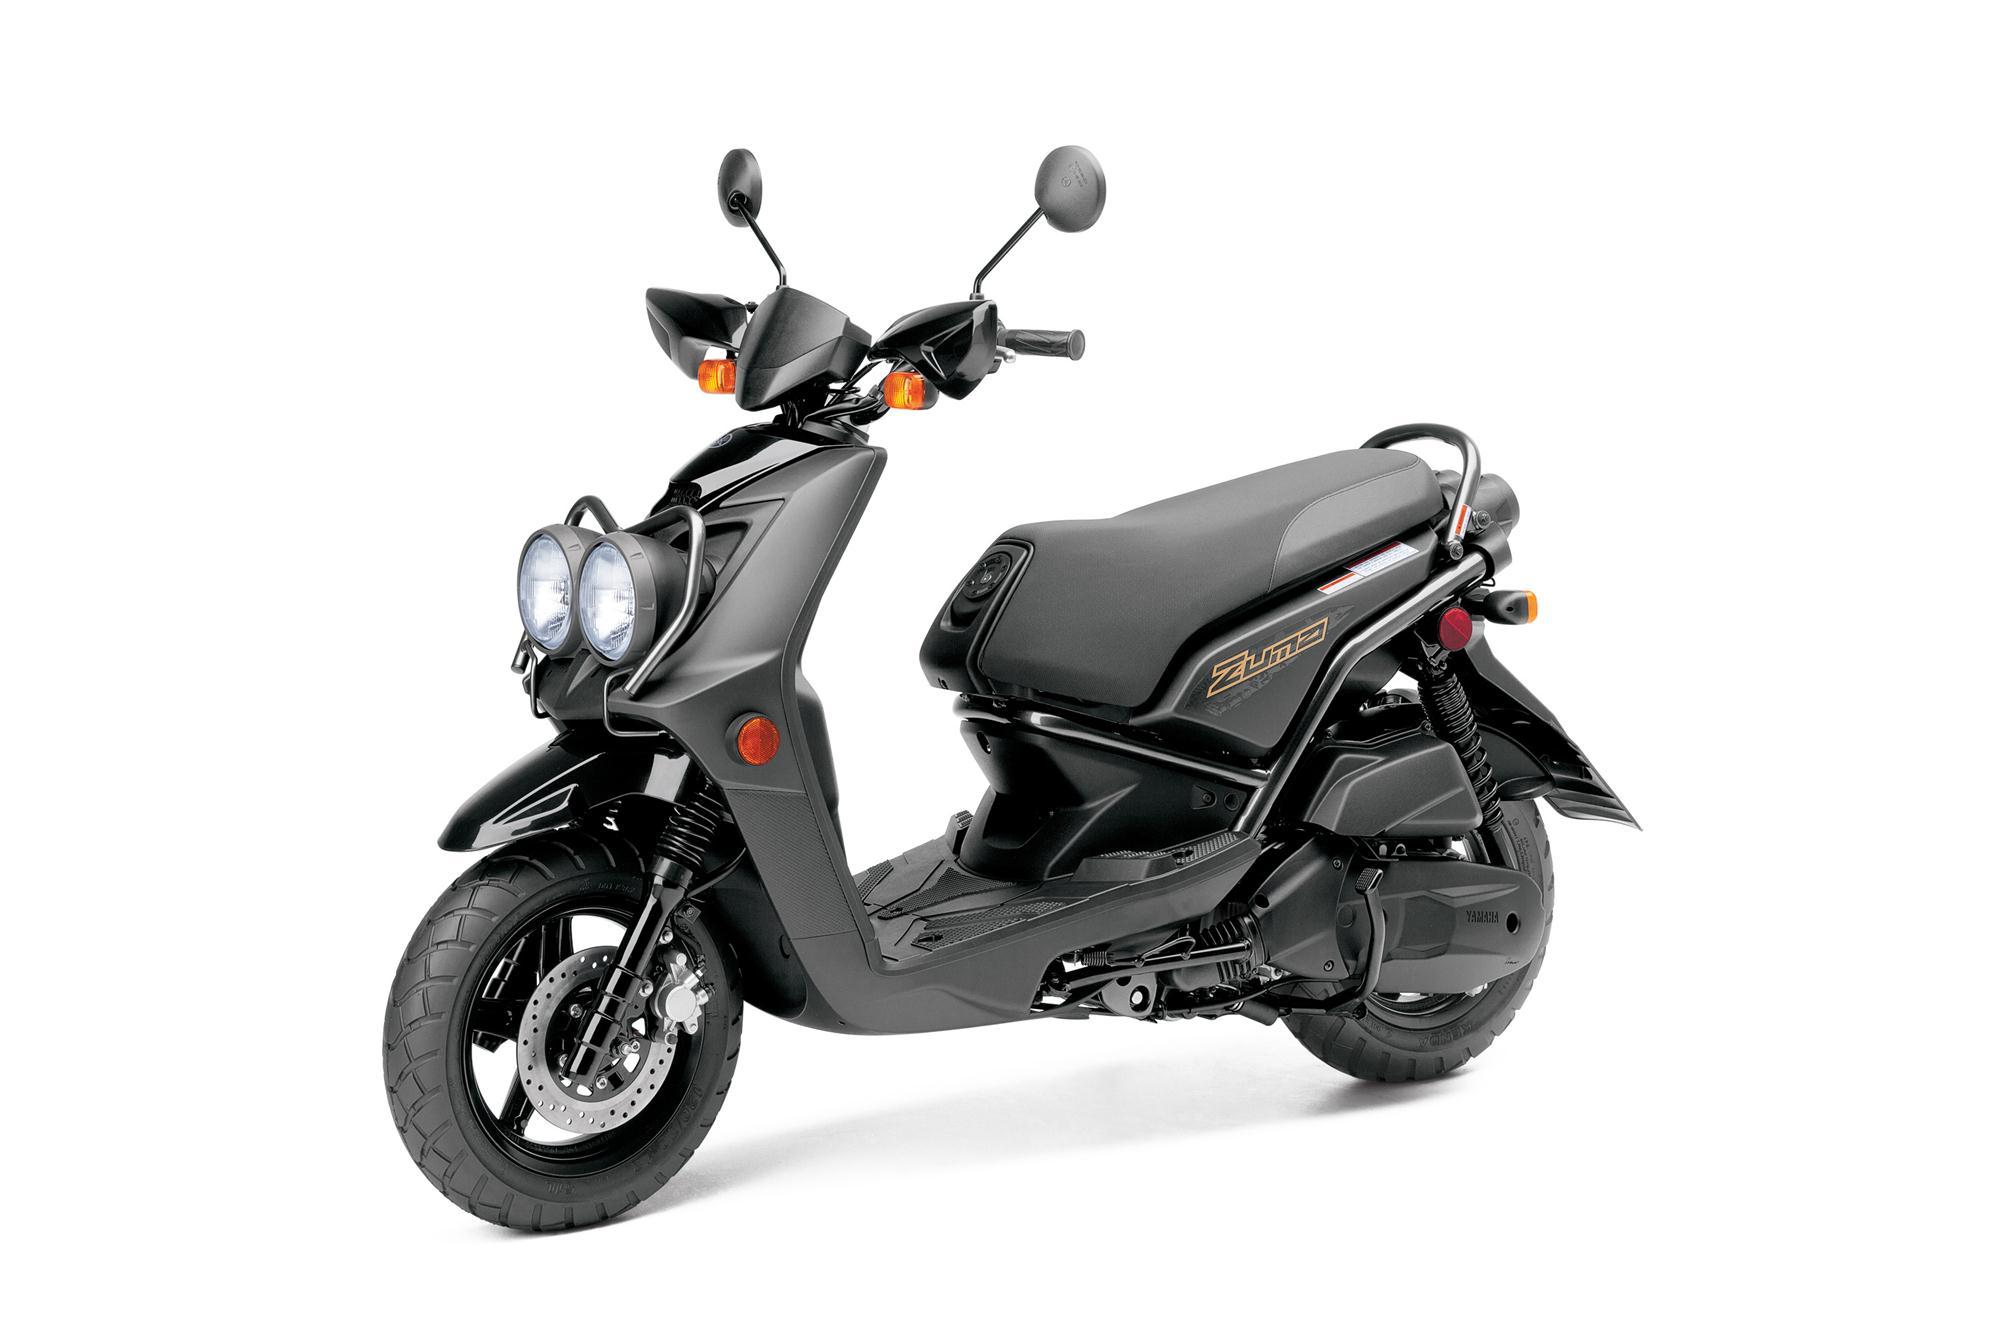 yamaha zuma moped. 2013 yamaha zuma 125 moped k